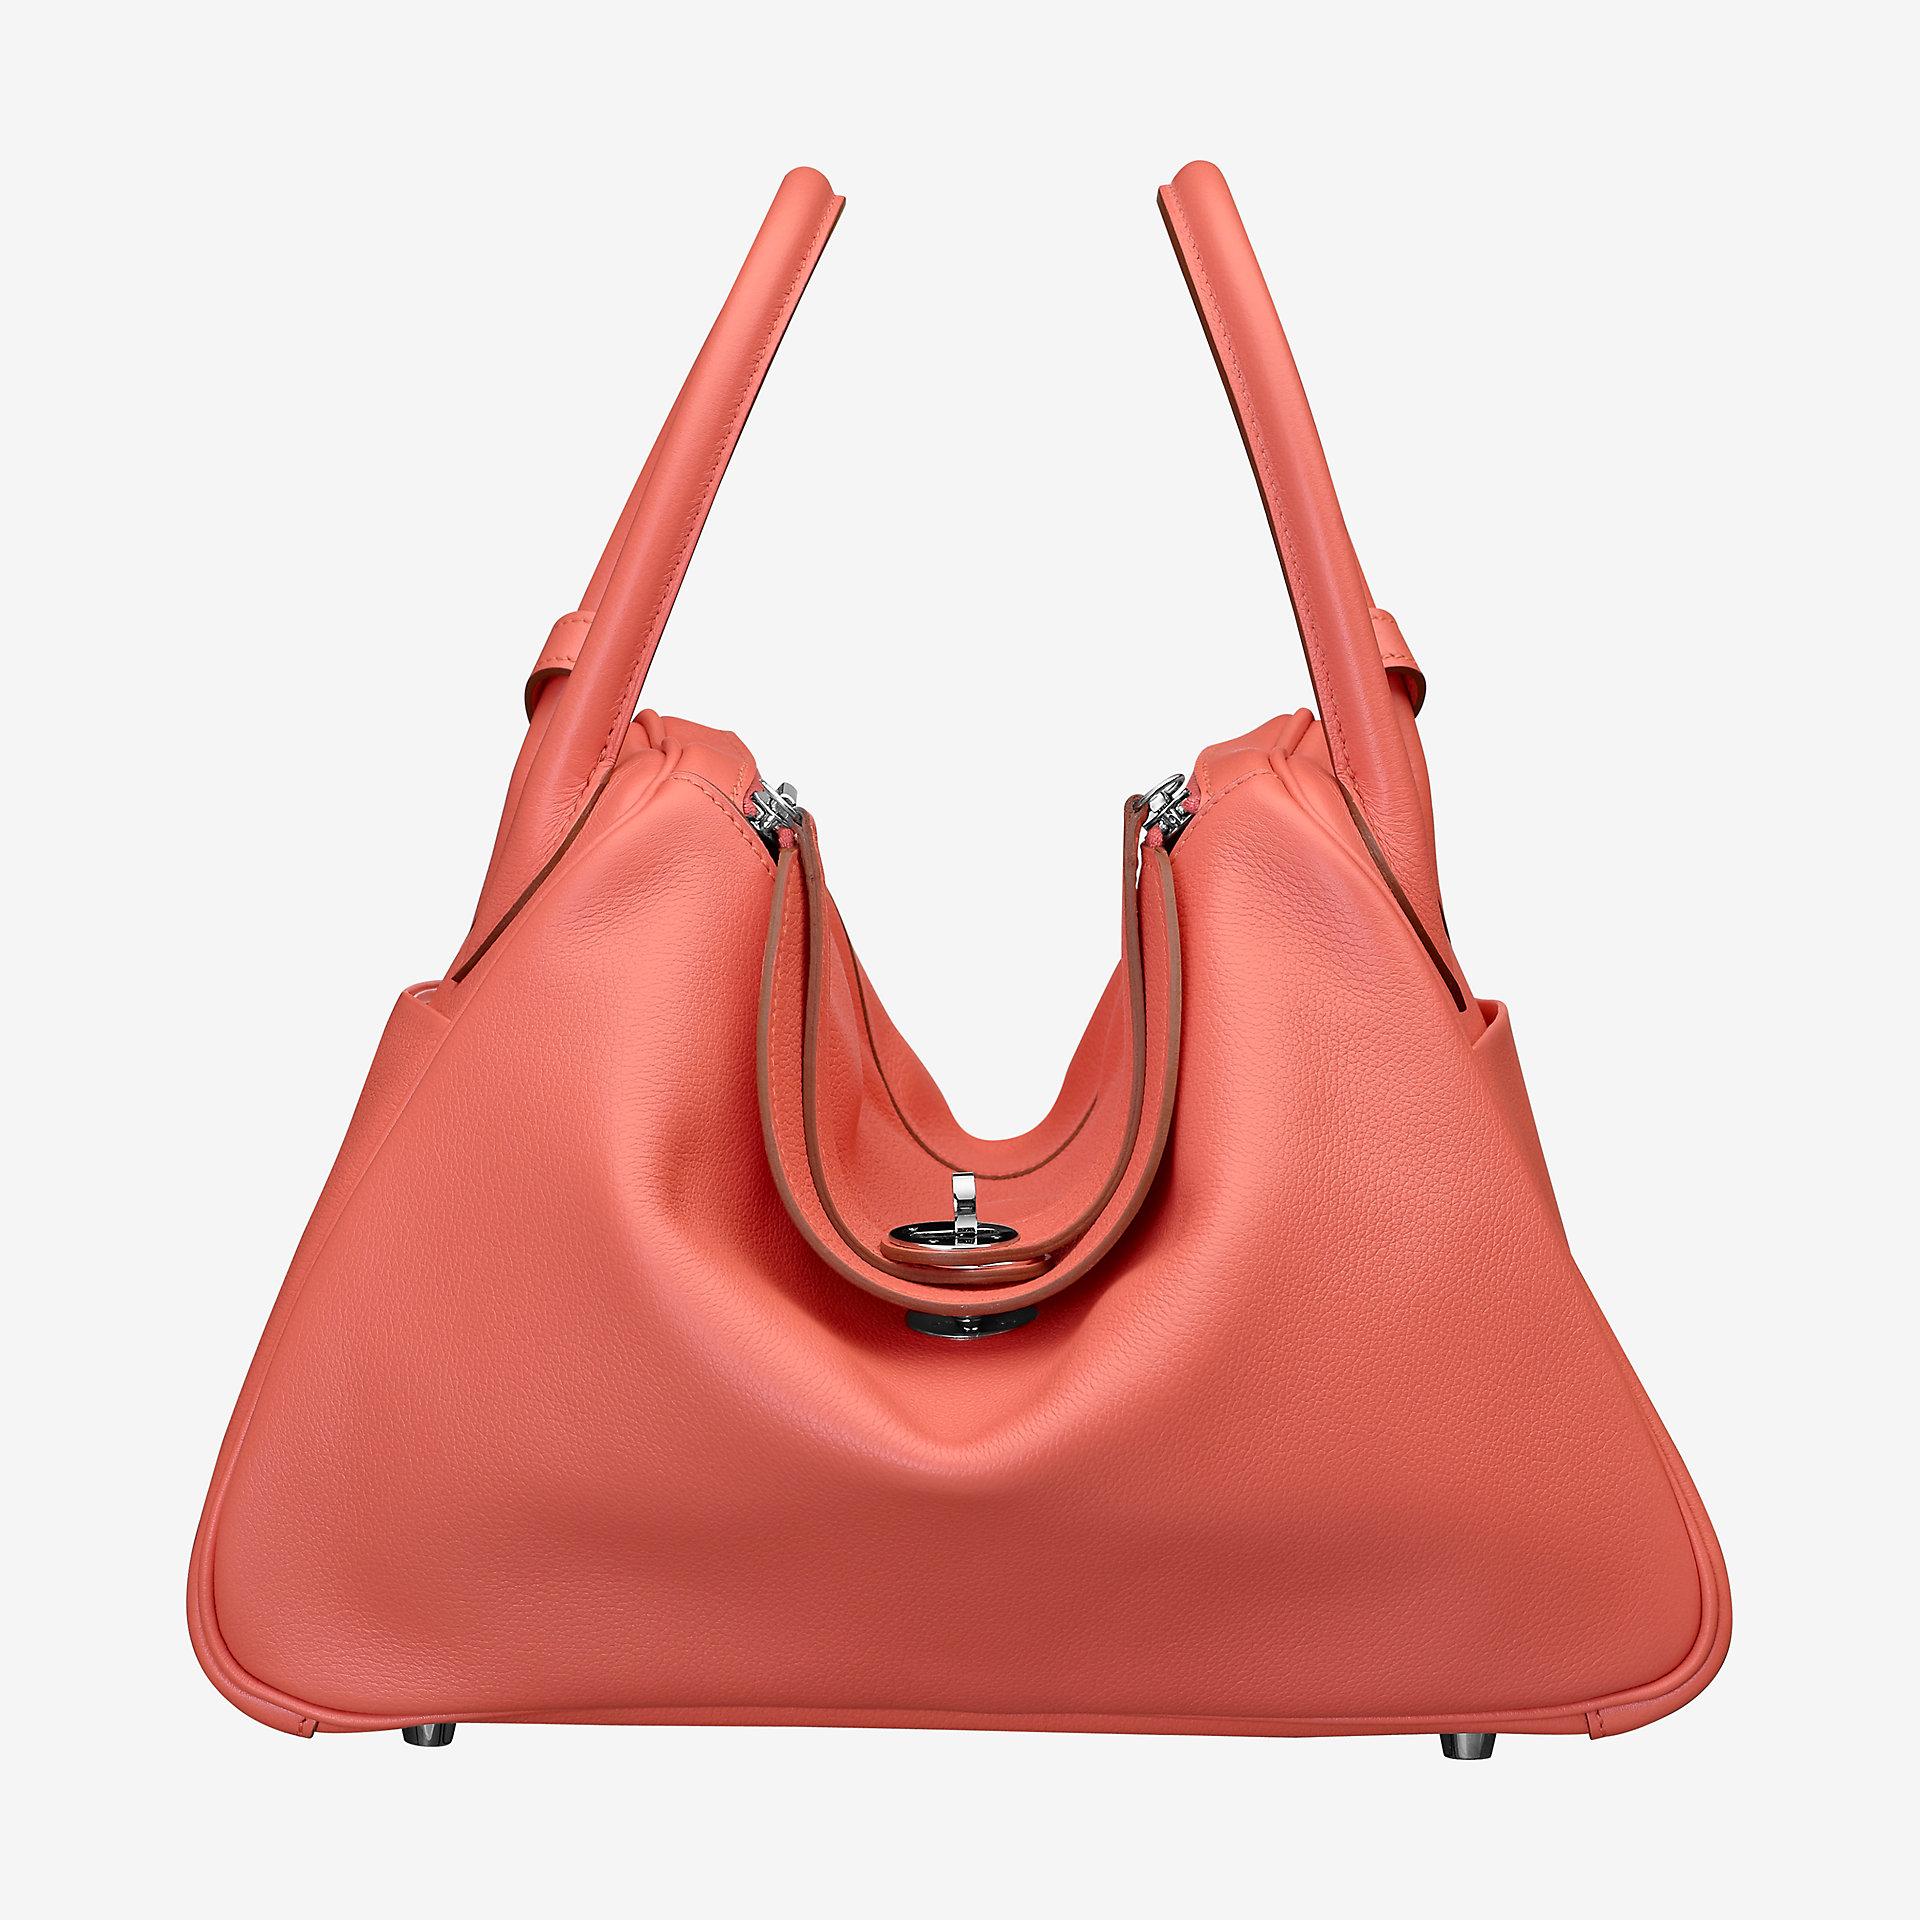 爱马仕琳迪包定制 Hermes Lindy 30 bag flamingo CKI5